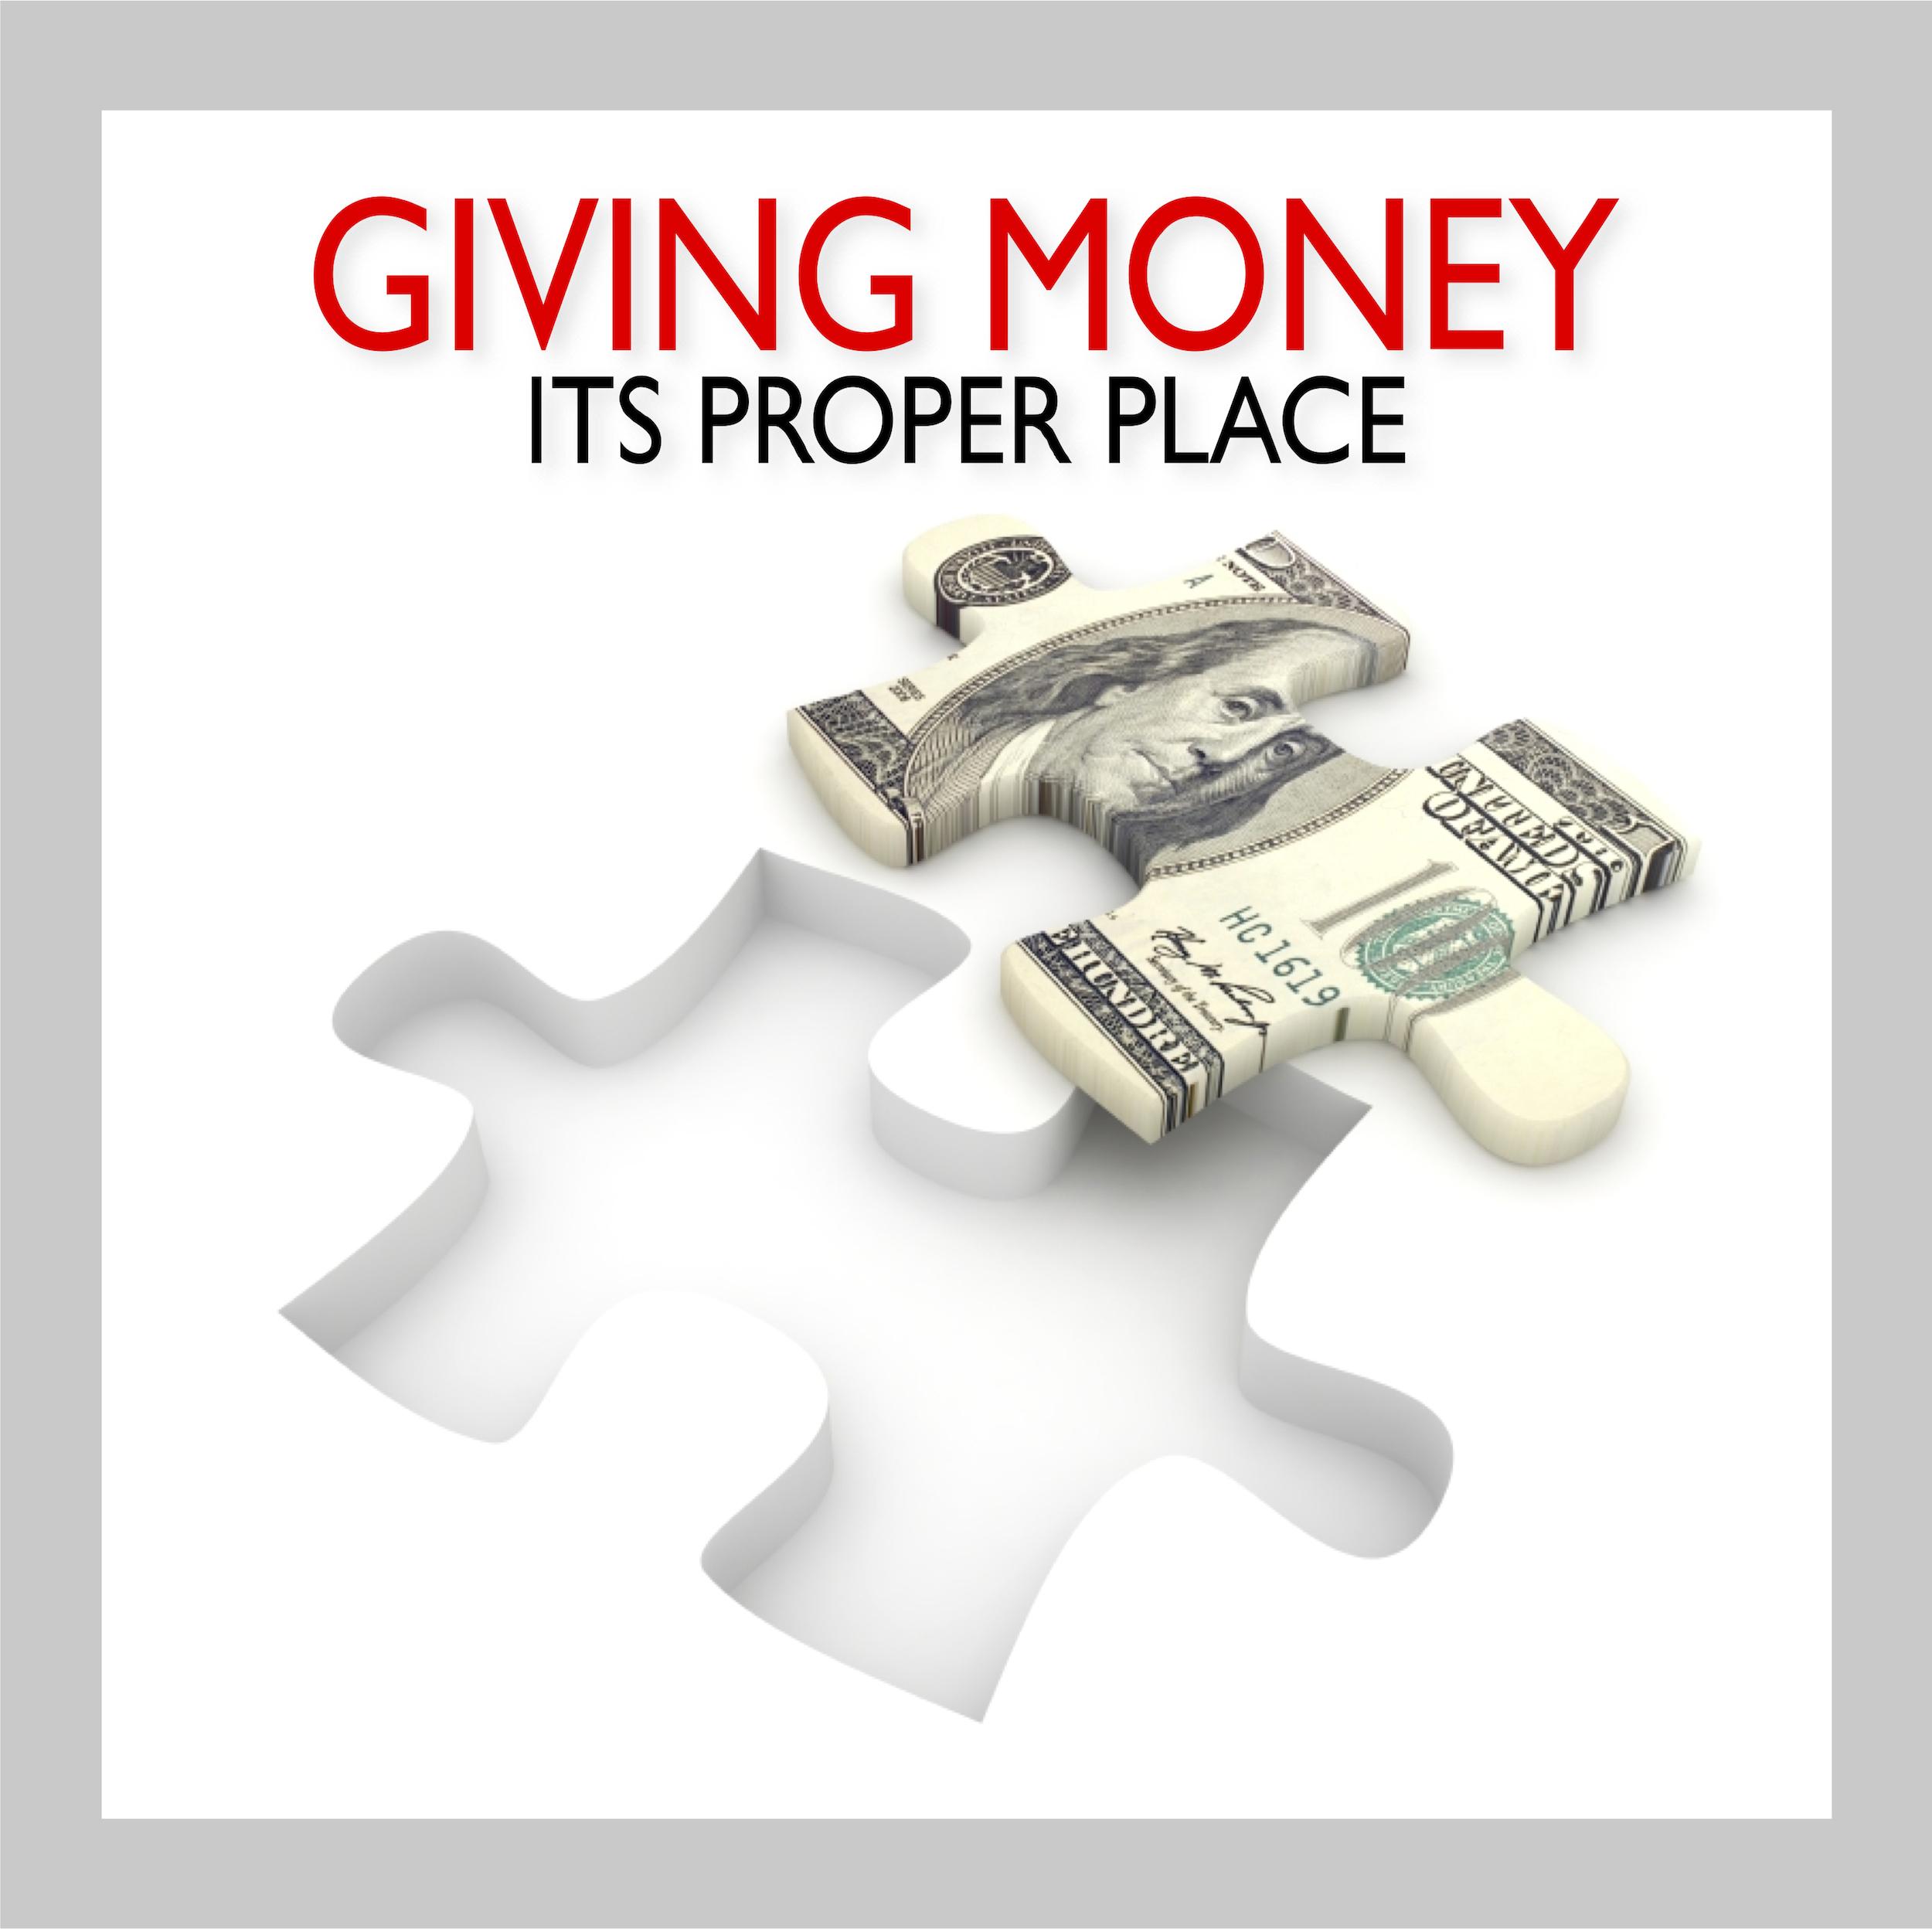 Giving Money Proper Place 1.jpg